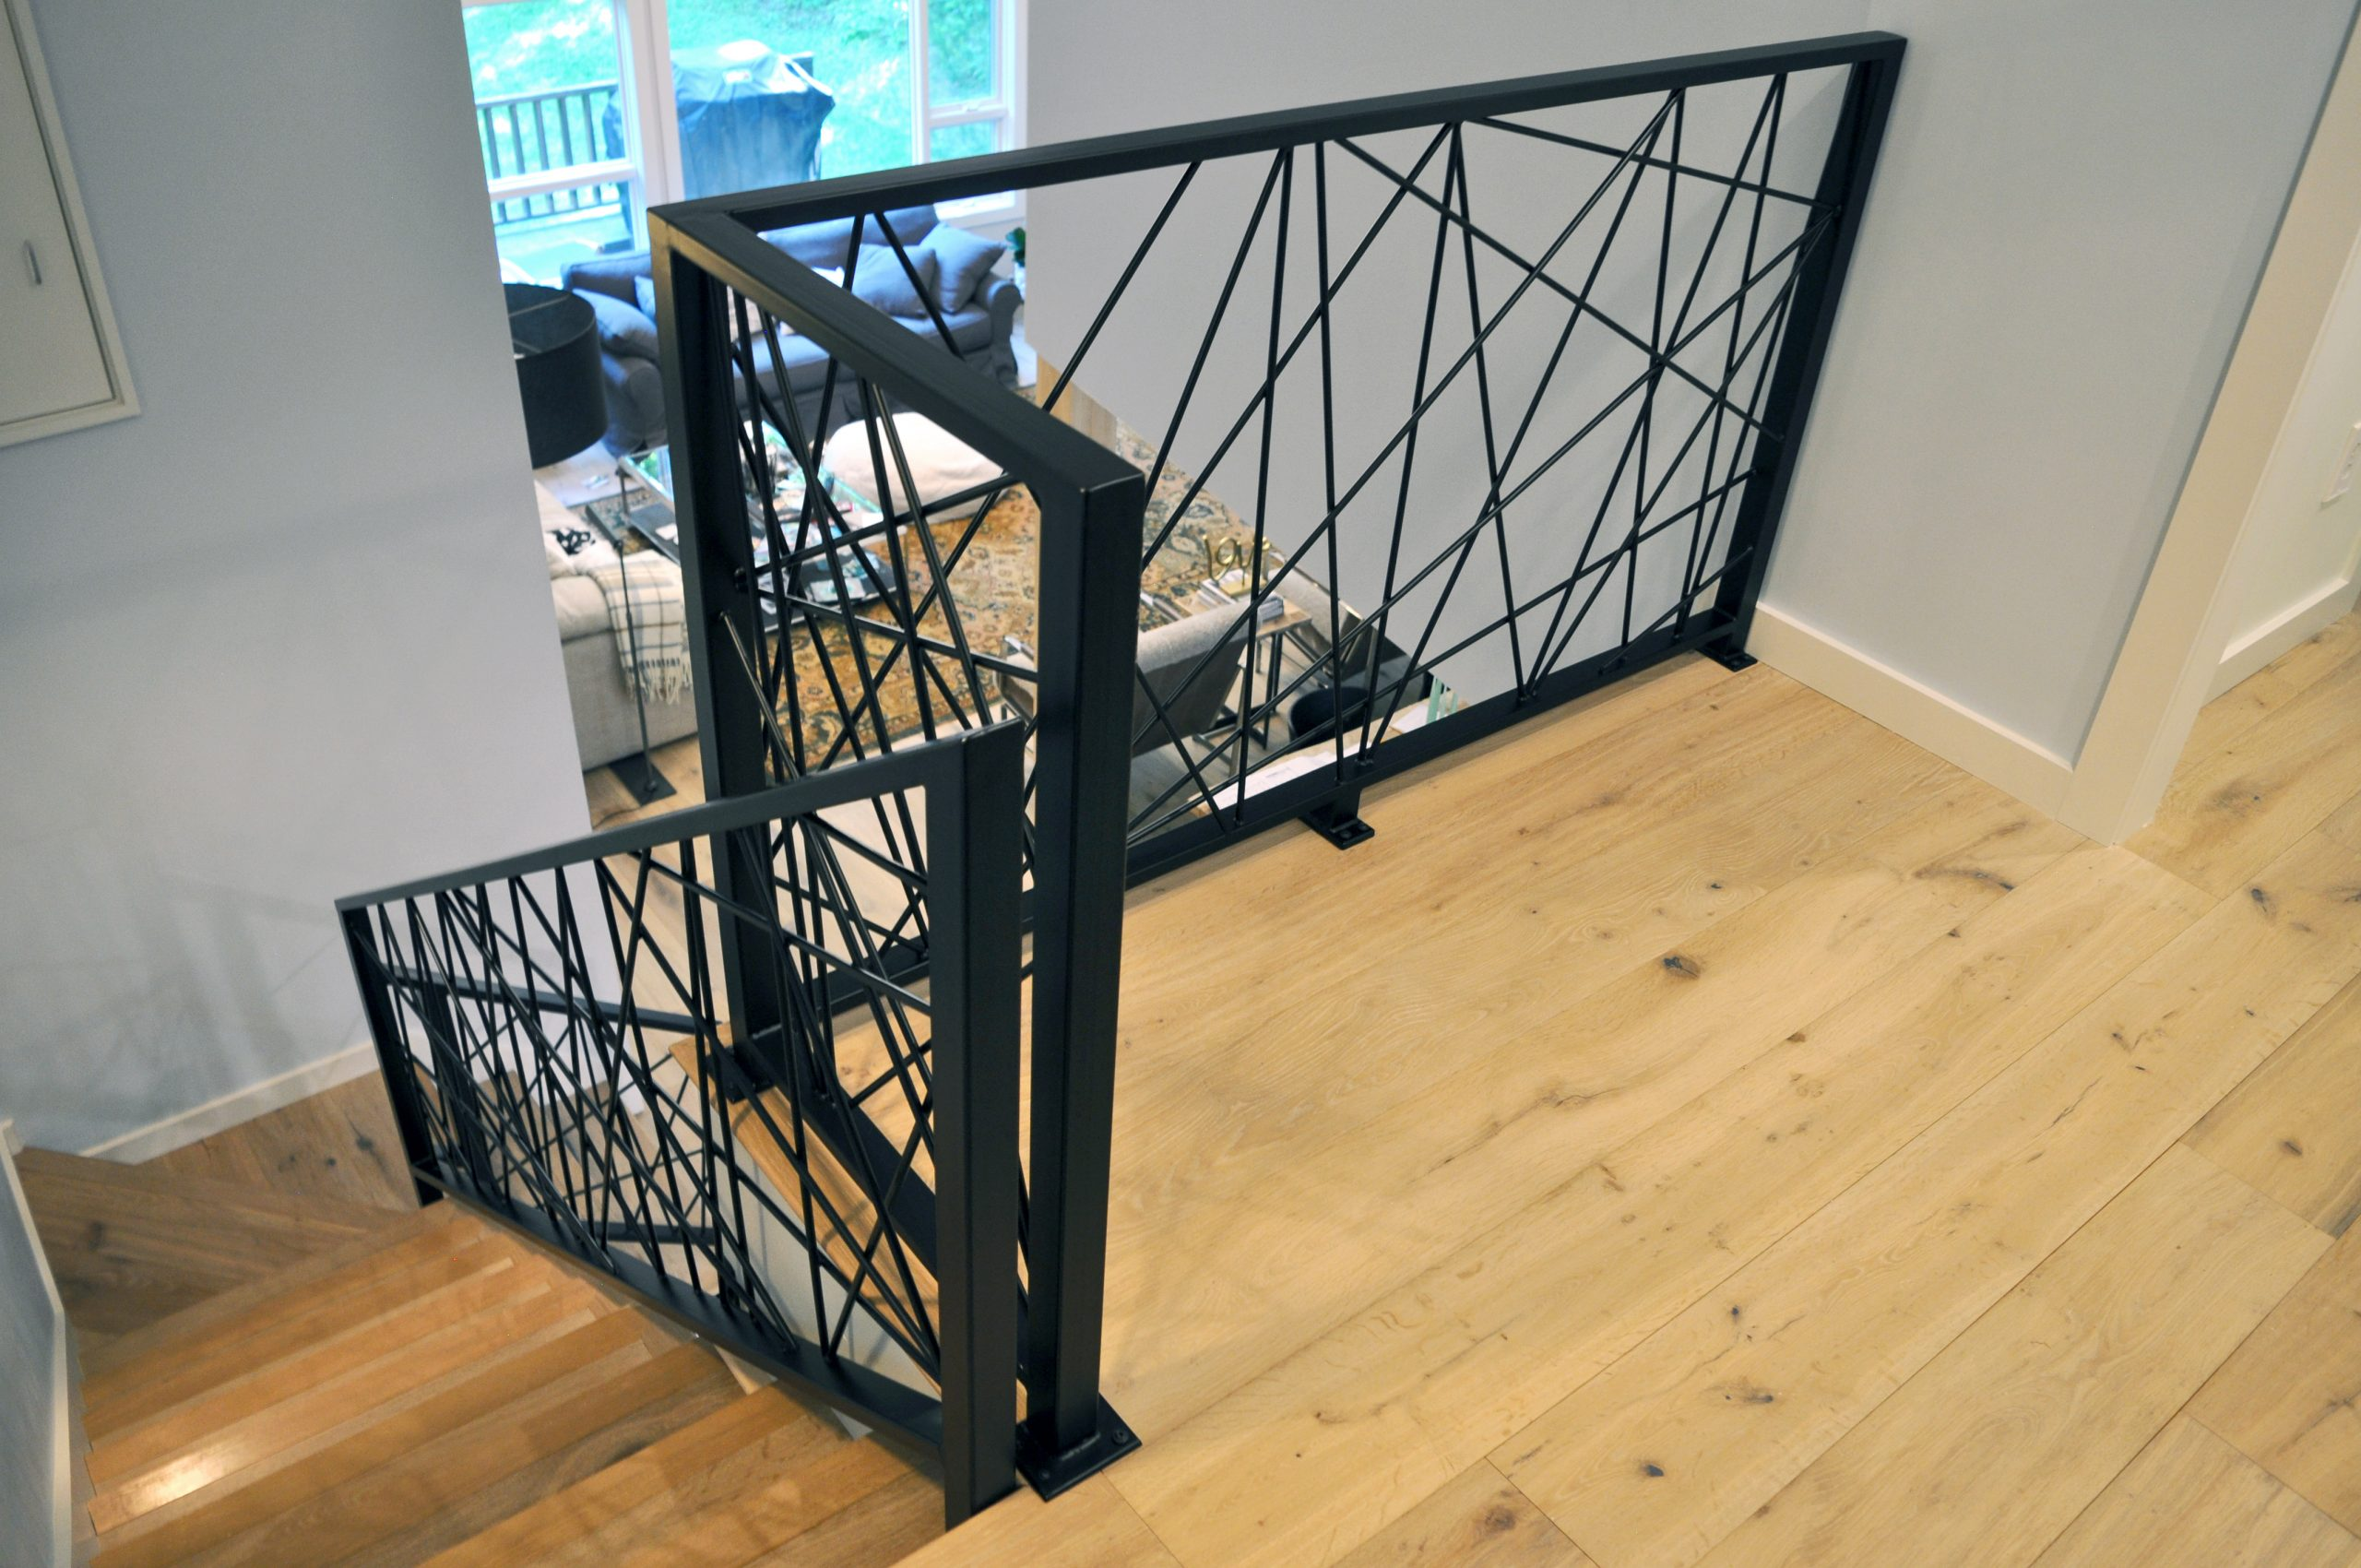 Black Steel Industrial Art balustrade